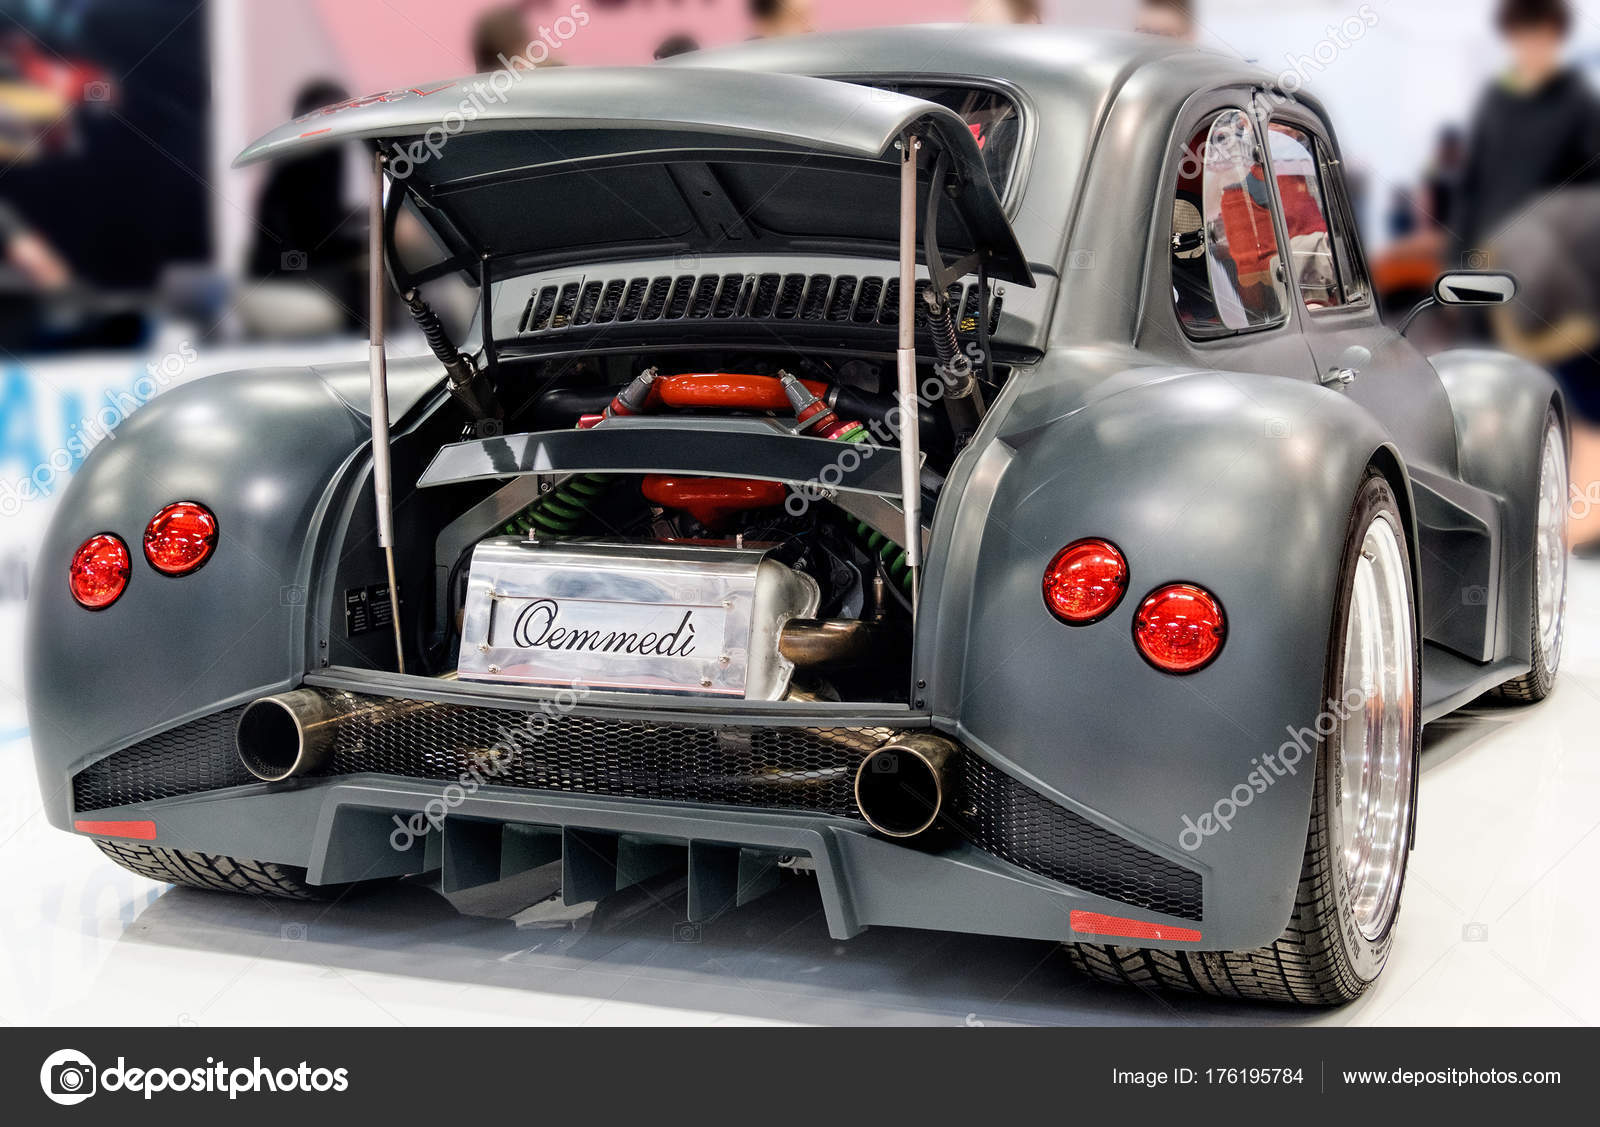 Schwarz Fiat 500 Lamborghini Italienischen Auto Mit Motor Im